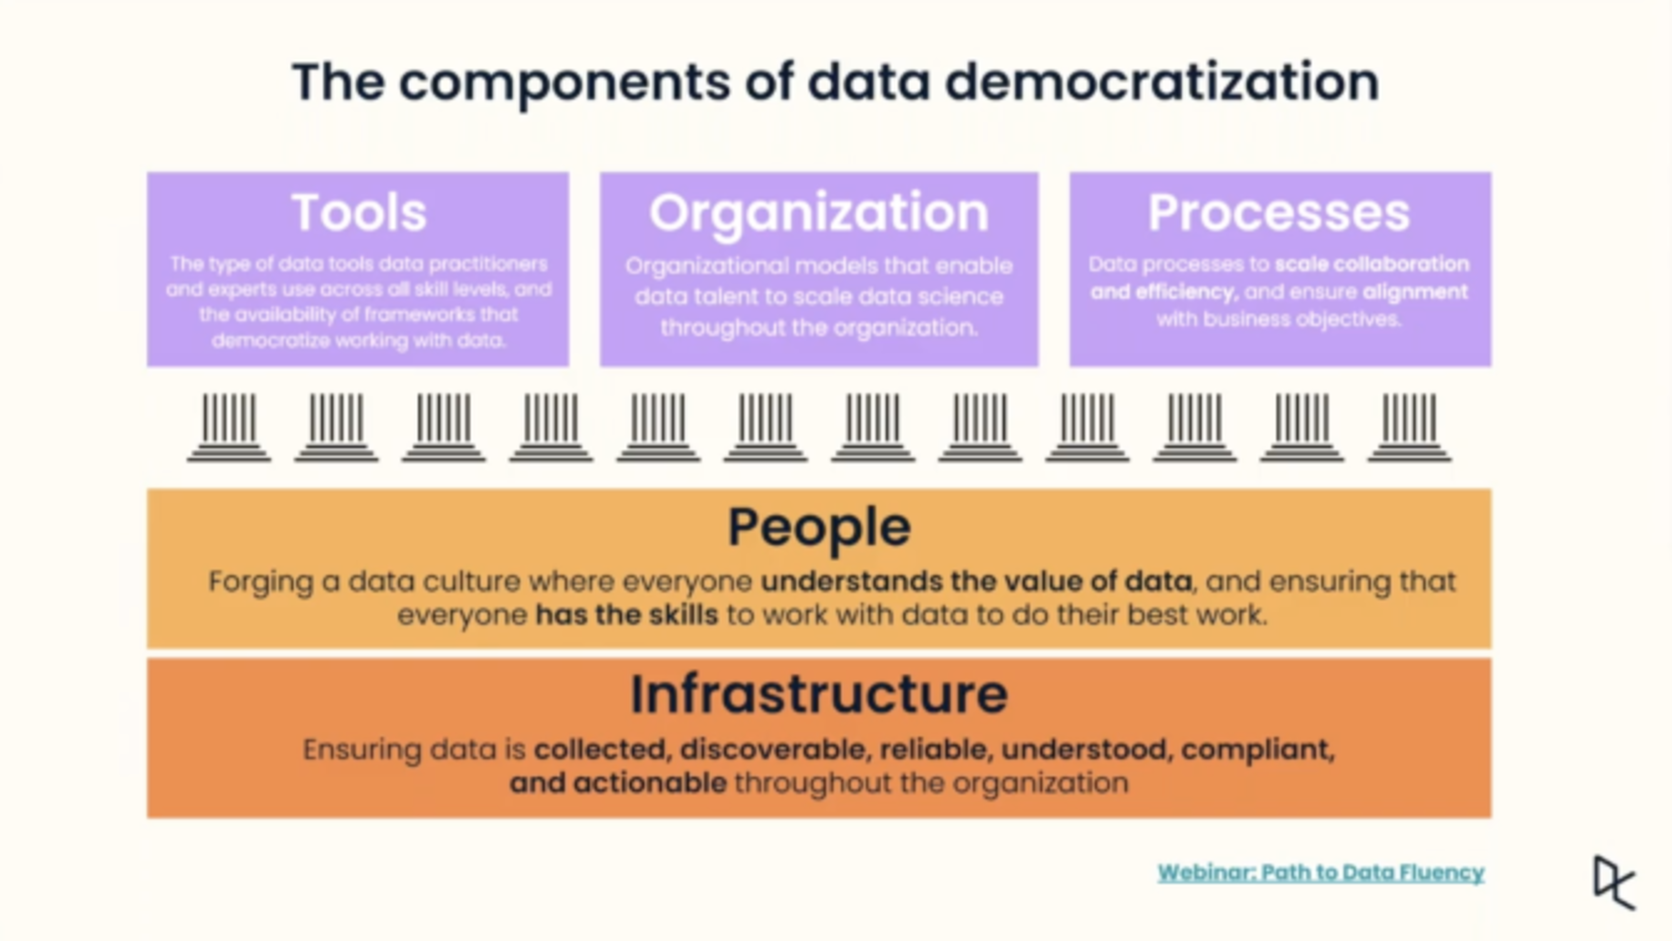 image_data_governance_6